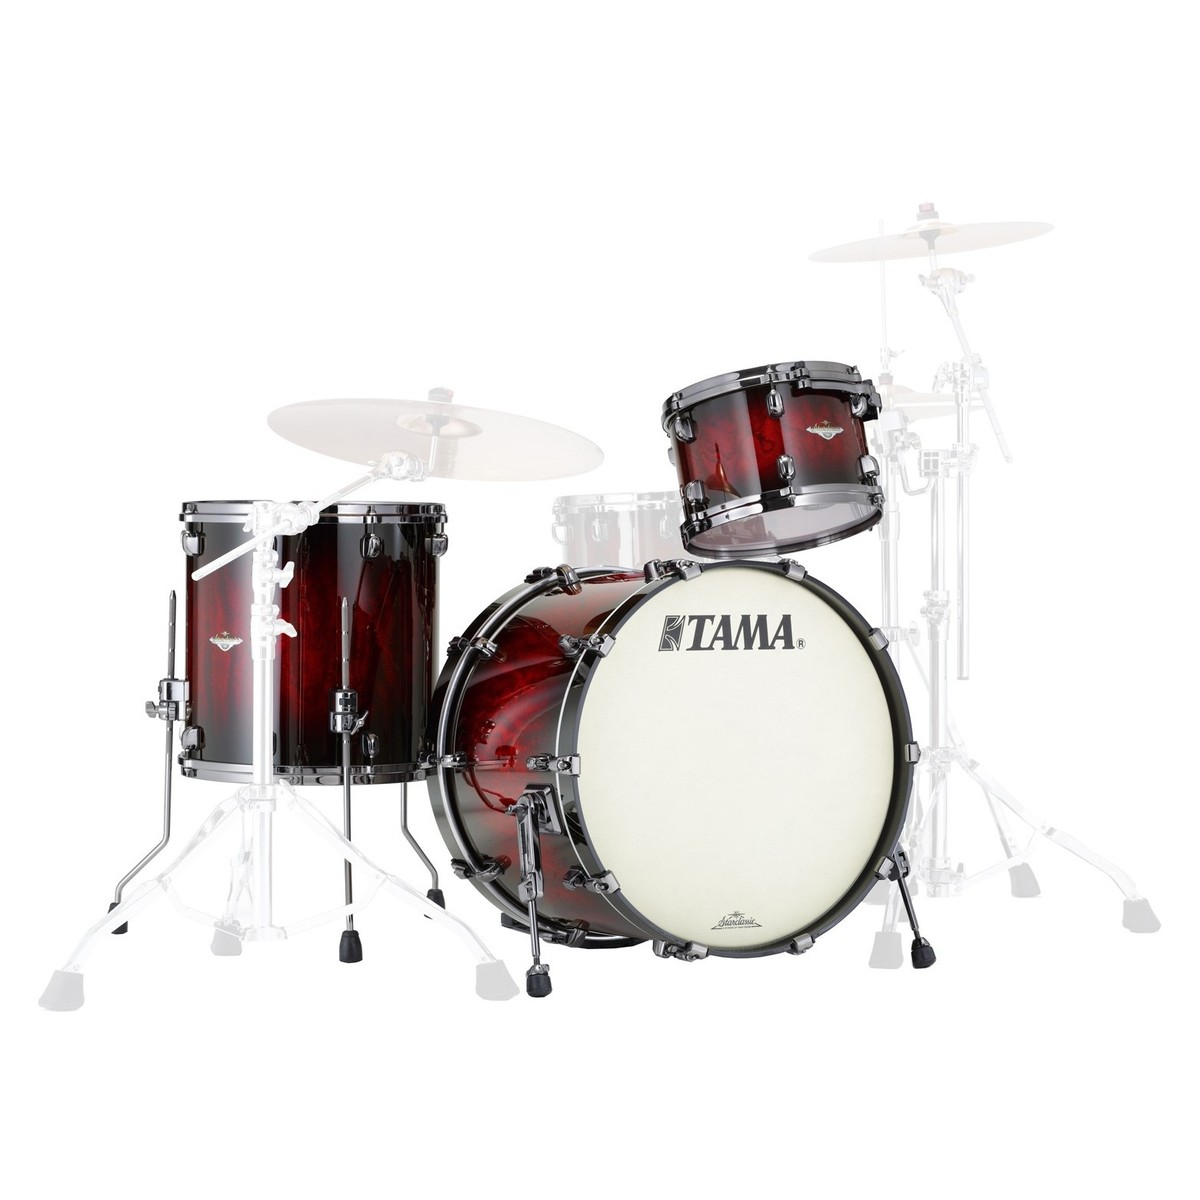 tama starclassic bubinga 22 39 39 3pc shell pack garnet quilted bubinga at gear4music. Black Bedroom Furniture Sets. Home Design Ideas